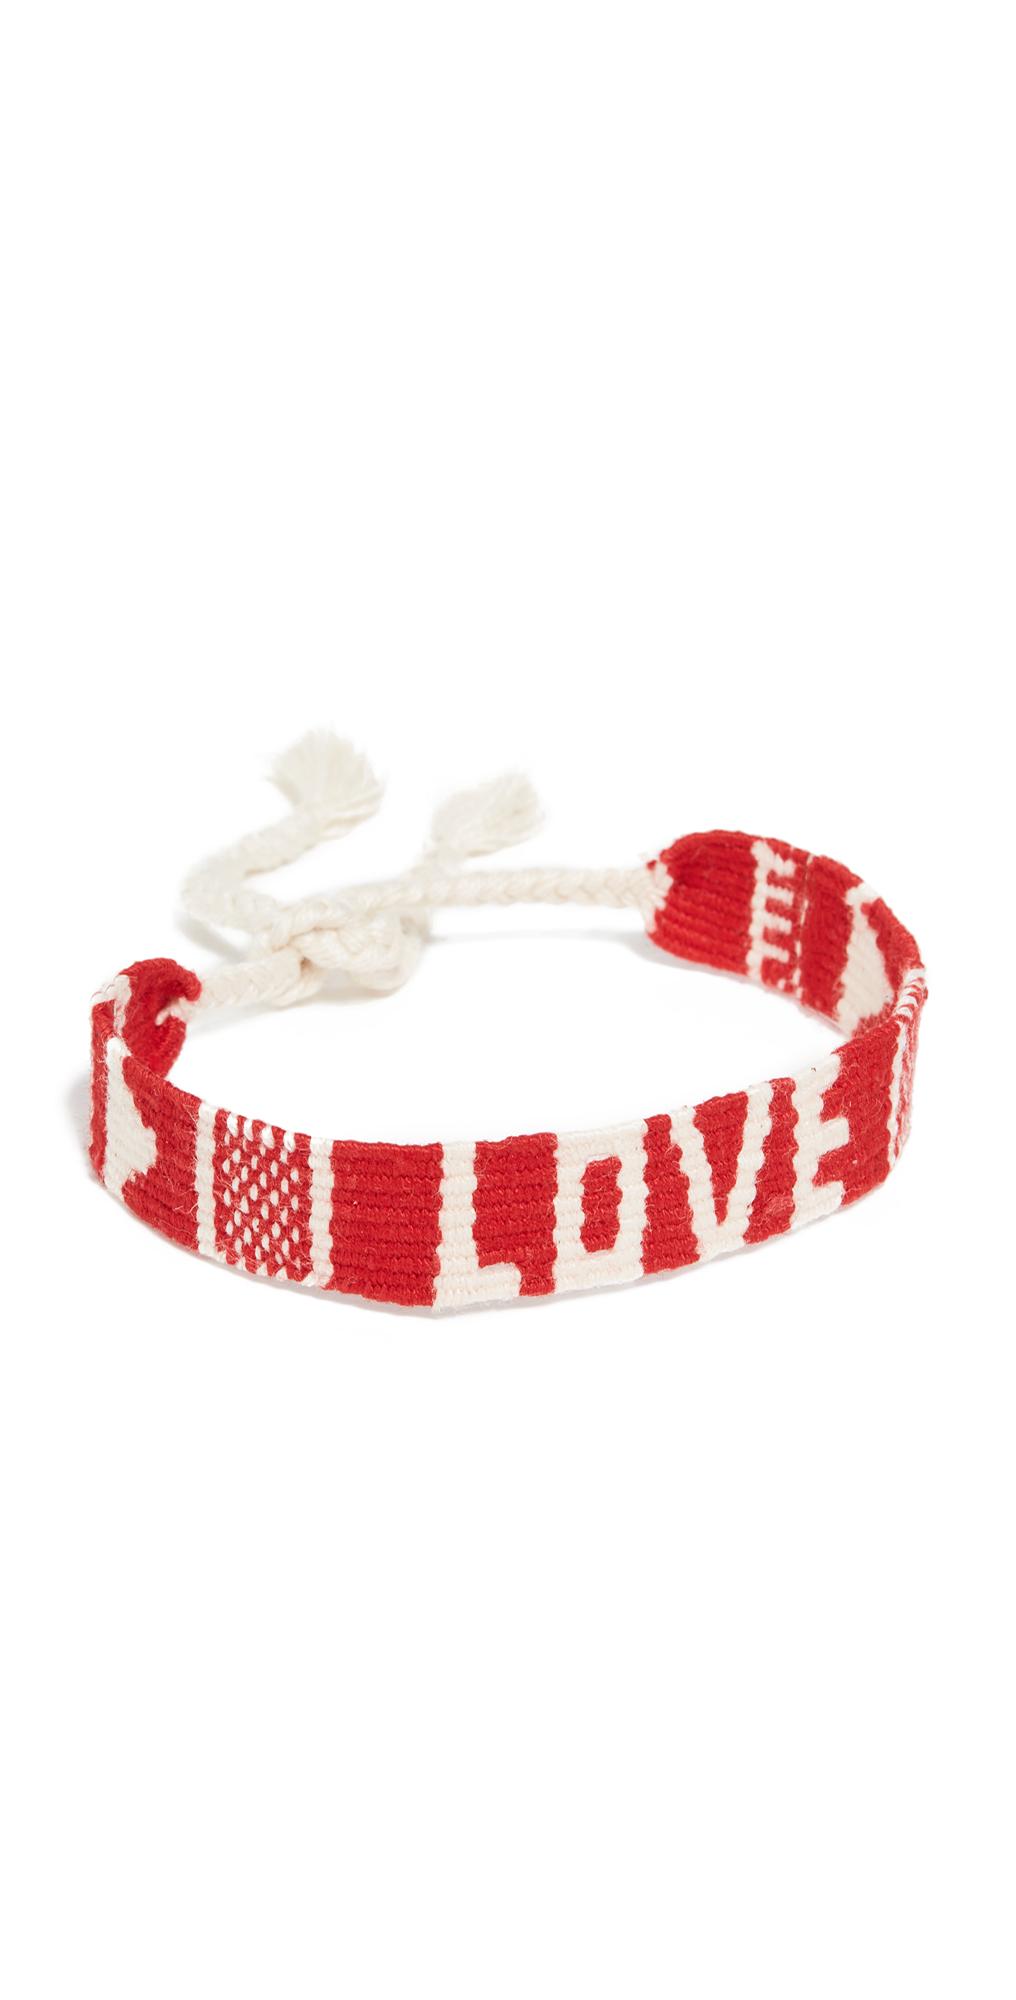 Mantra Woven Bracelet